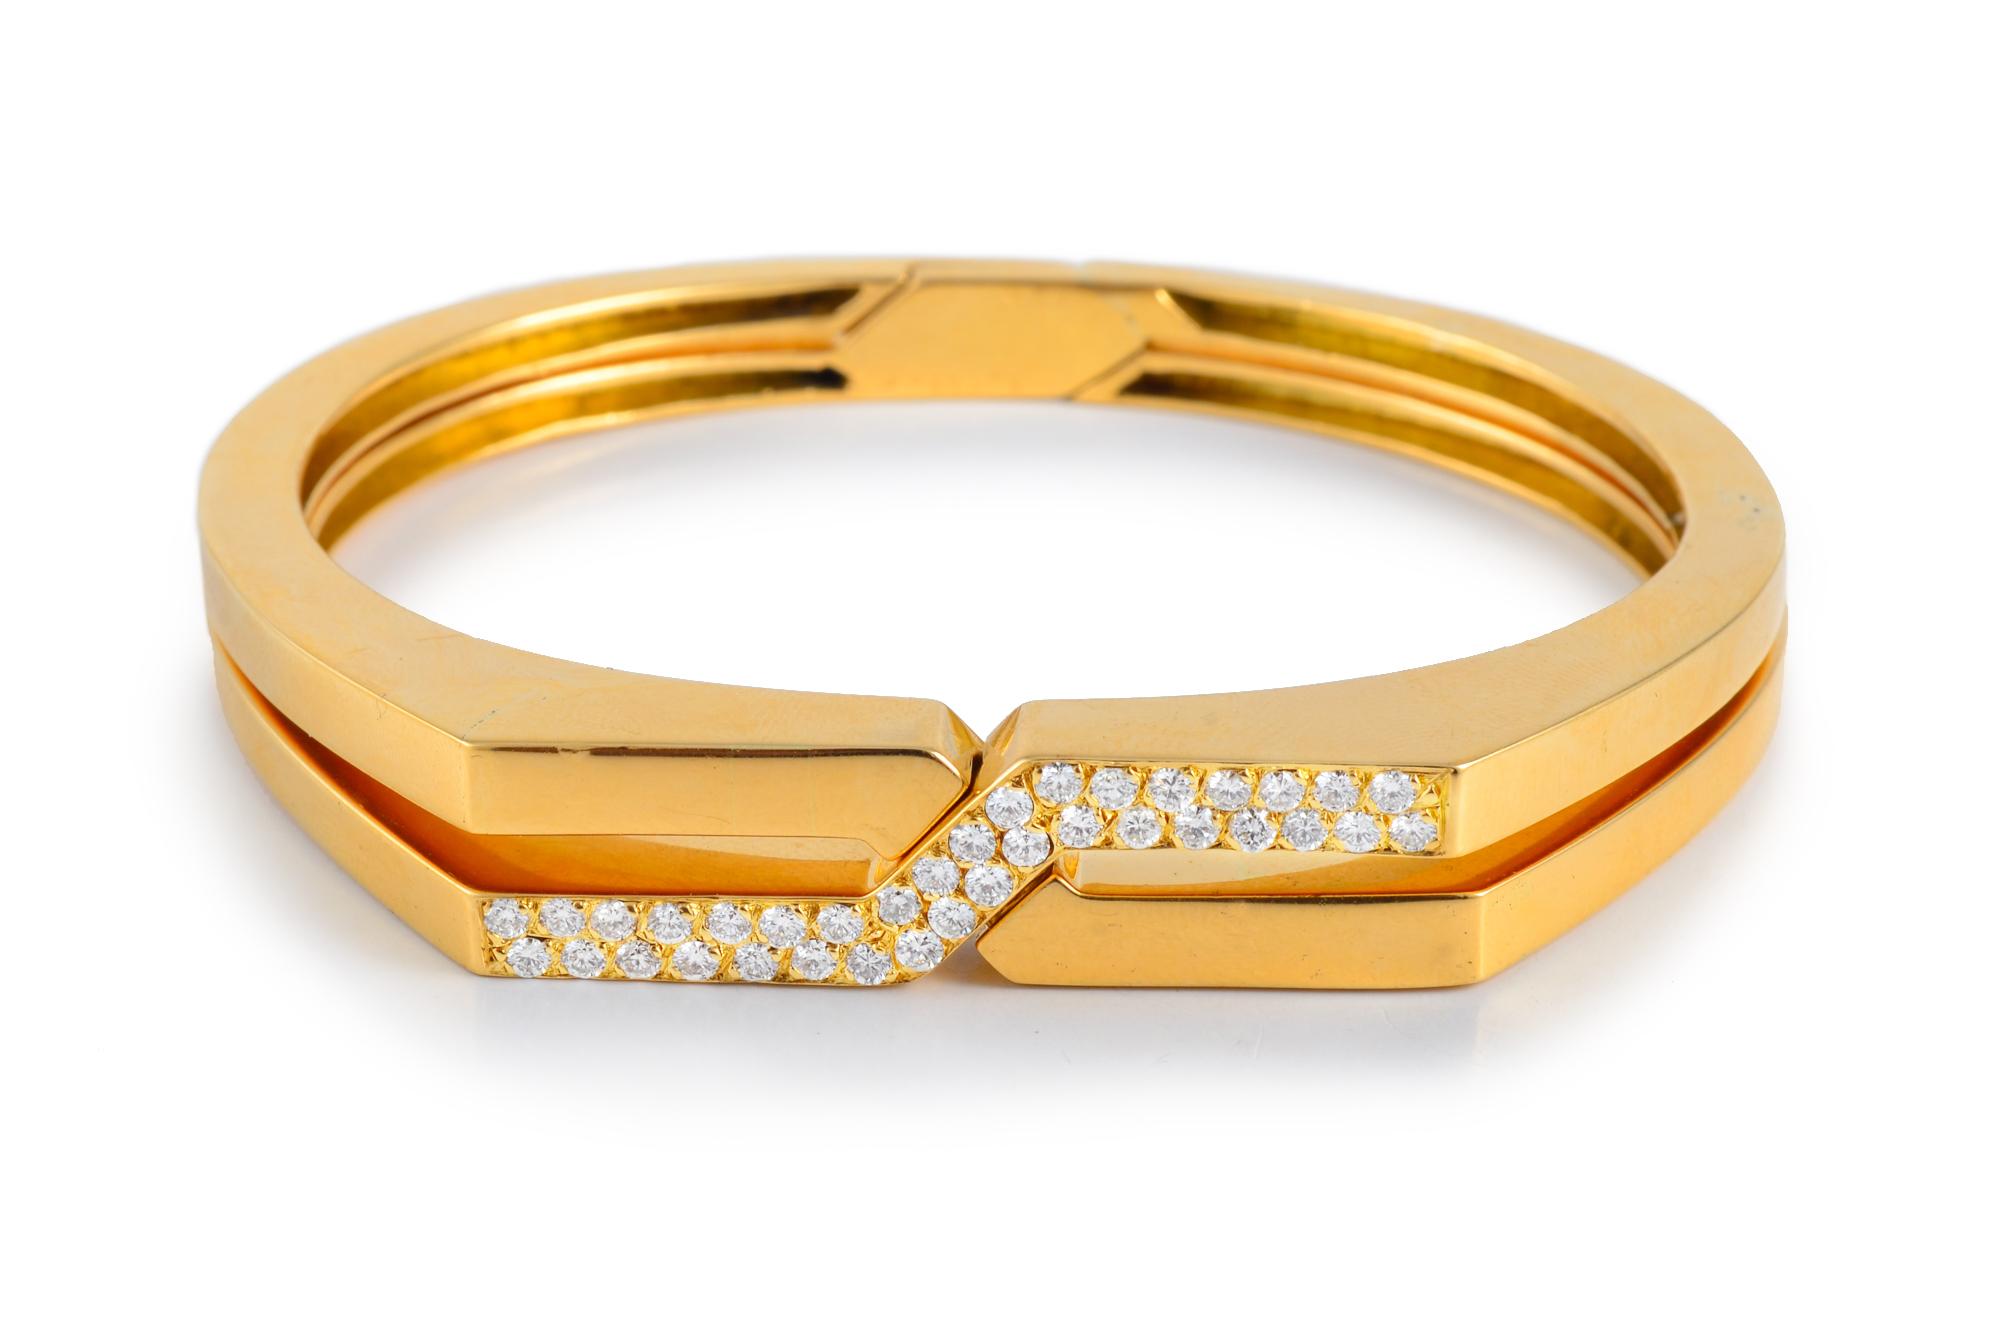 Van Cleef & Arpels Diamond Interlocking Gold Bangles